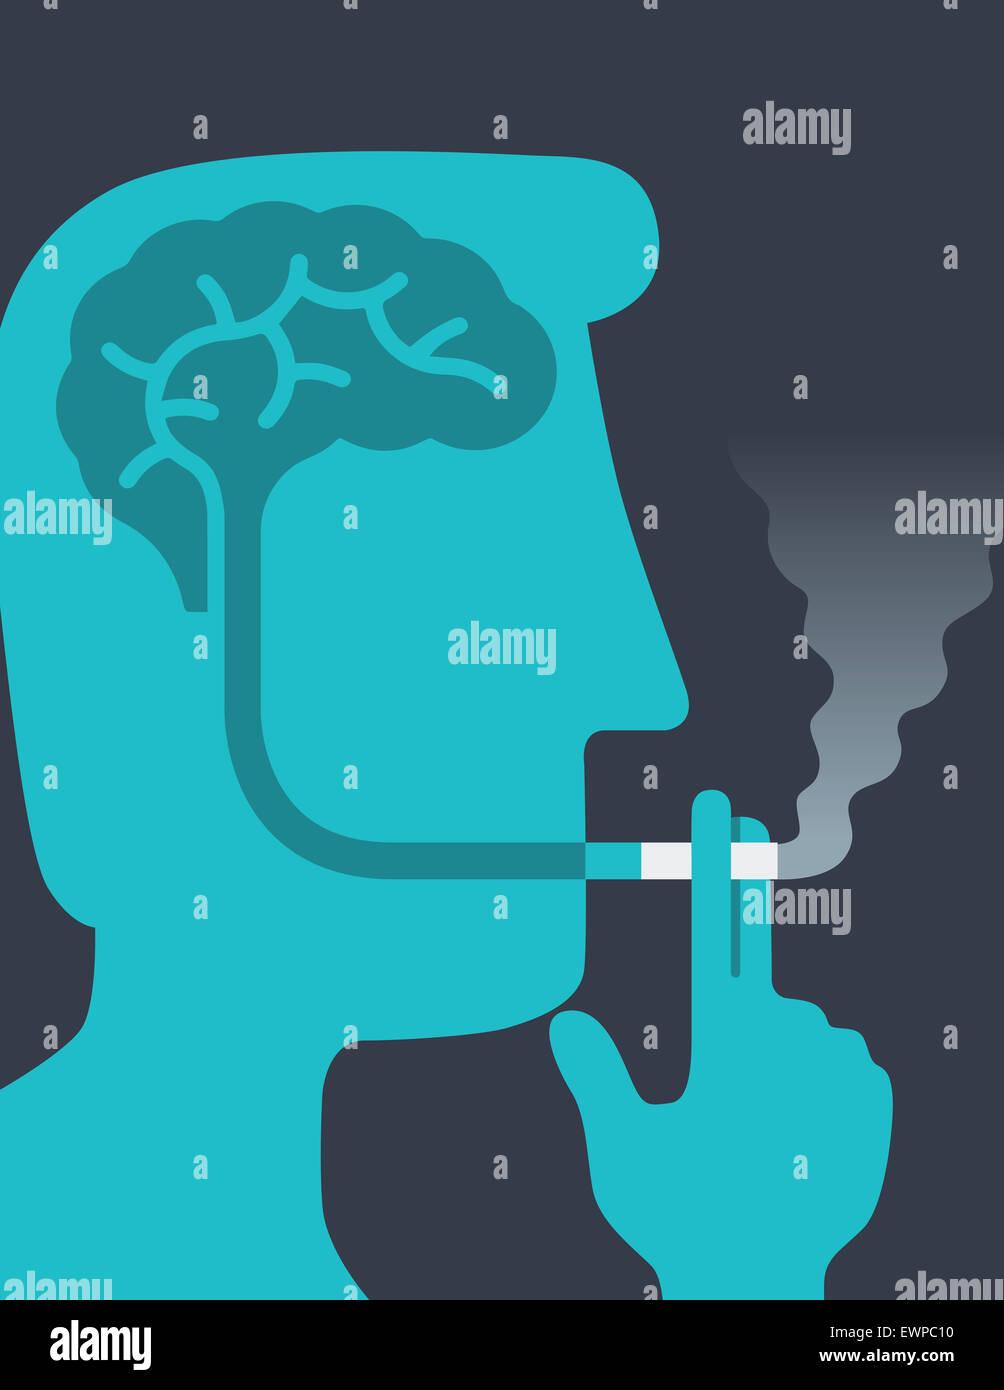 Anatomy of man brain representing danger smoking cigarette - Stock Image